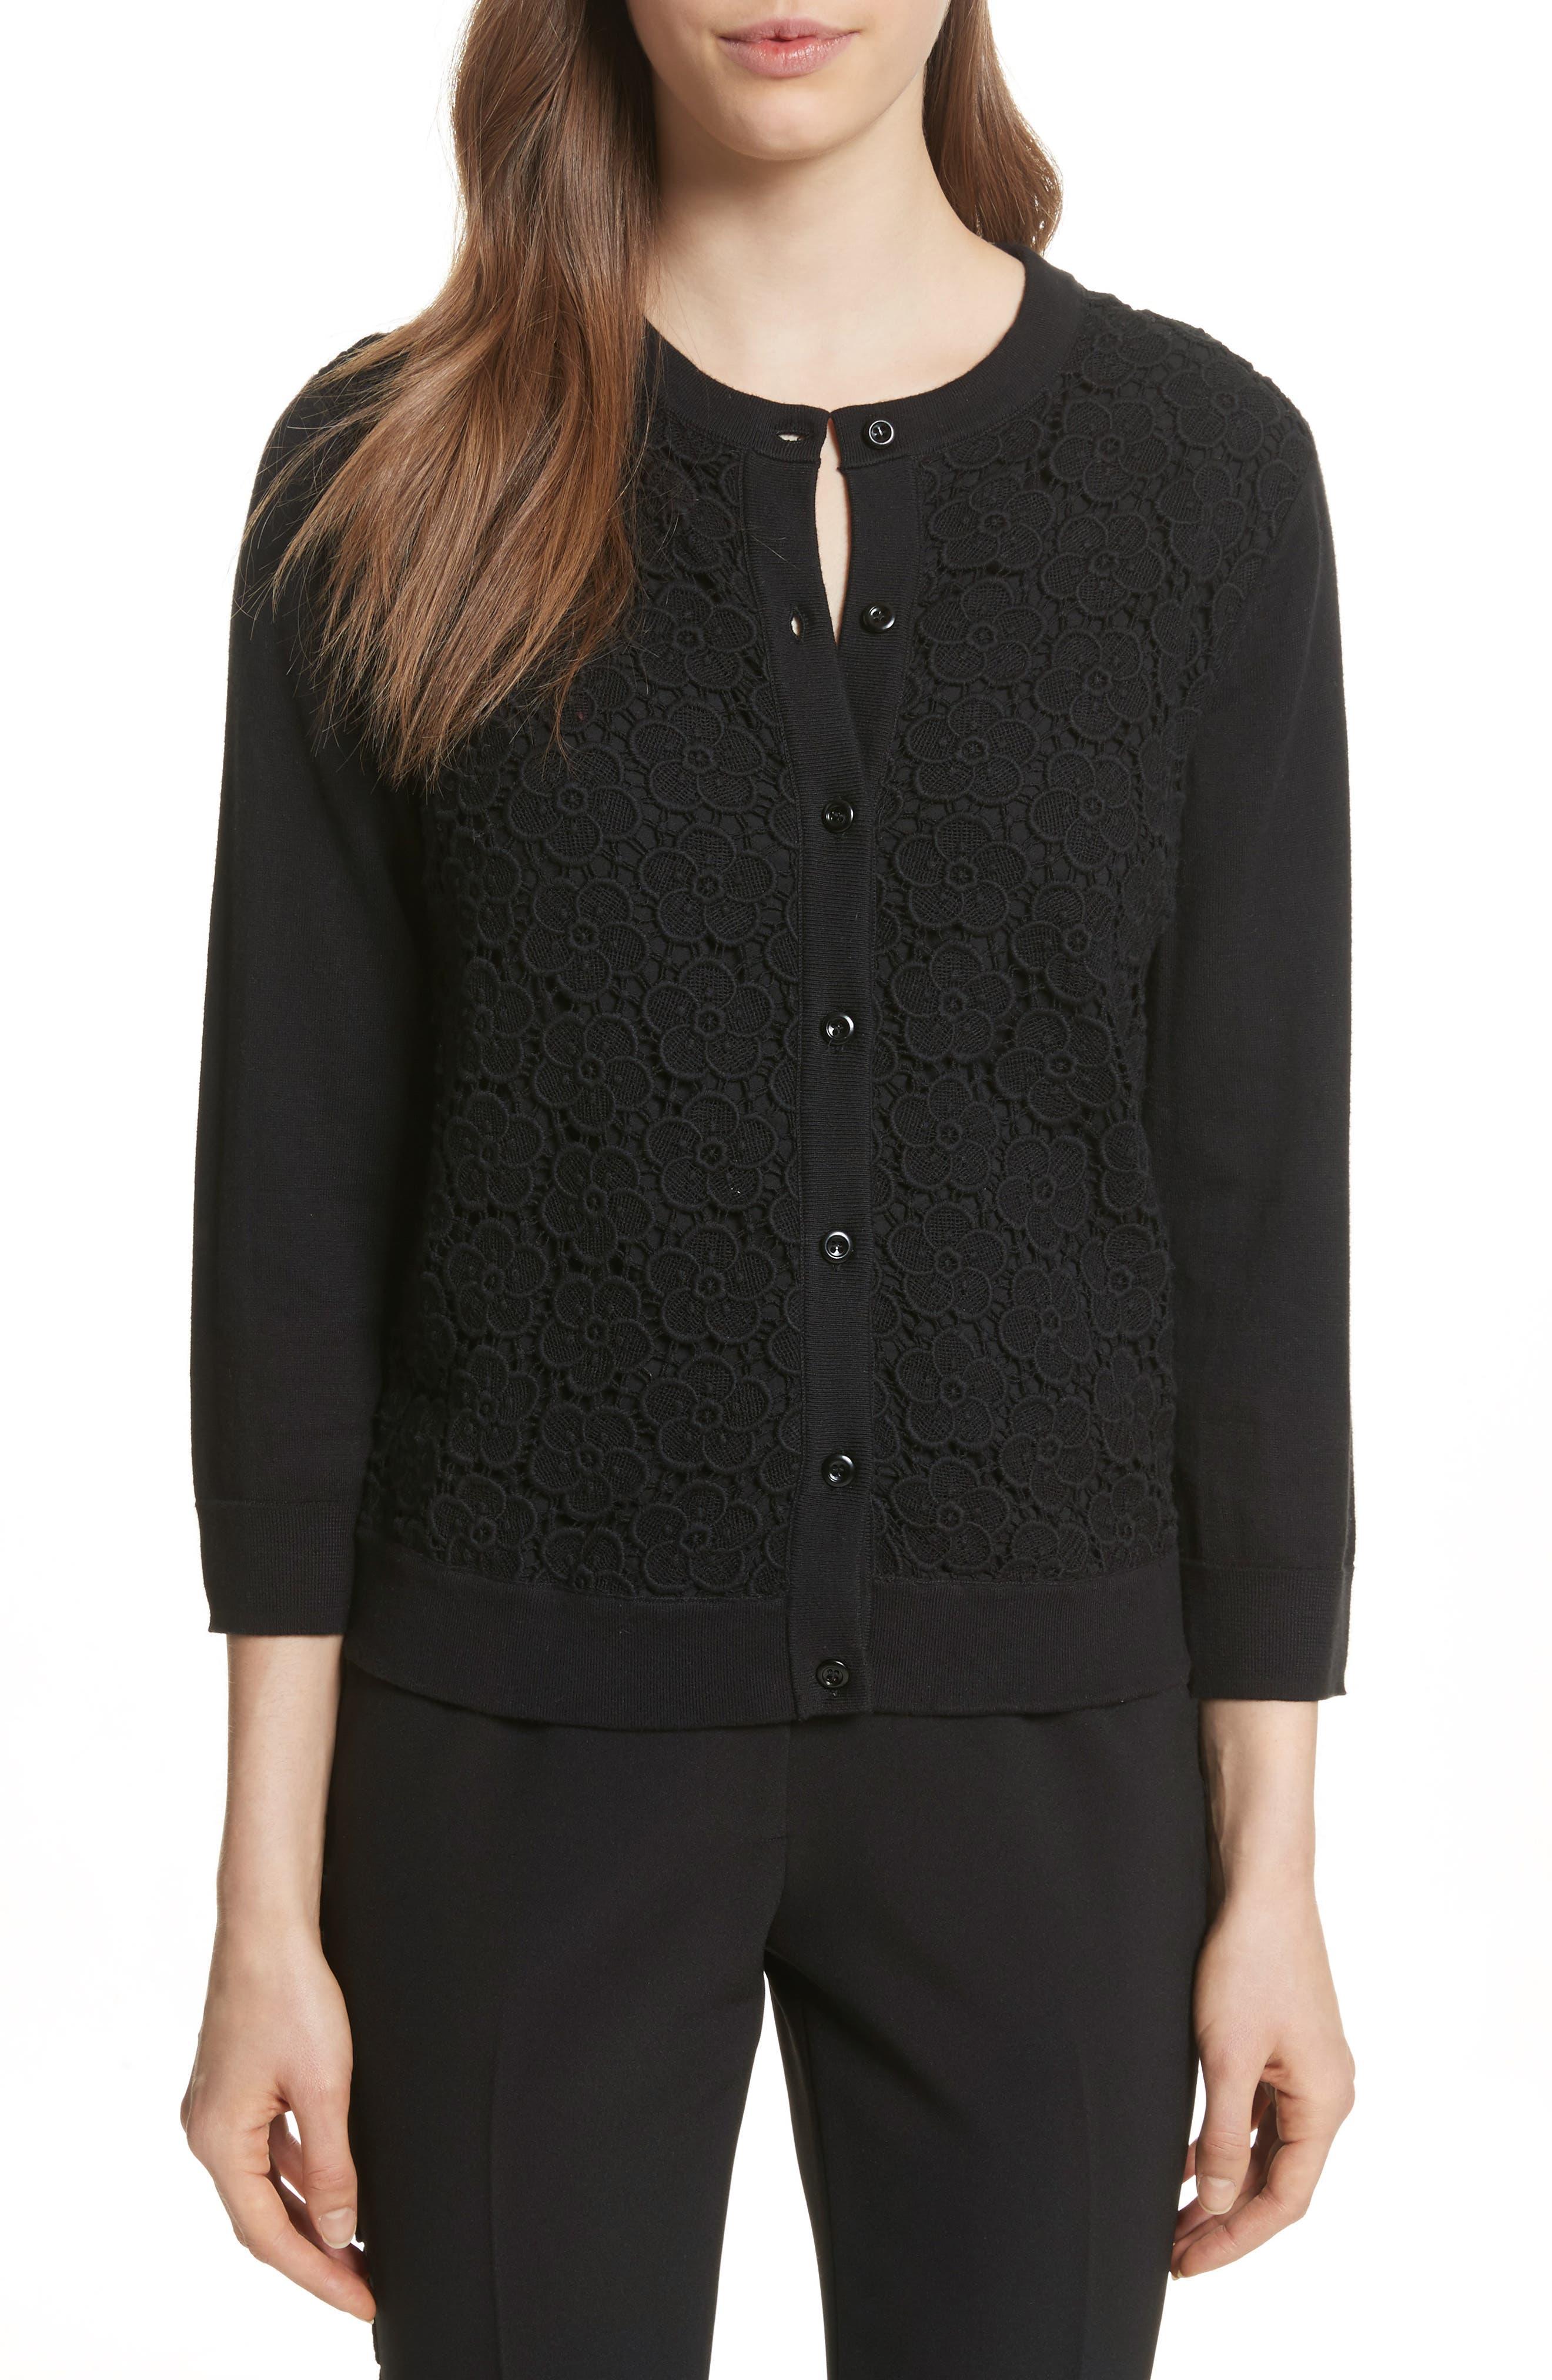 bloom floral lace cardigan,                         Main,                         color, Black